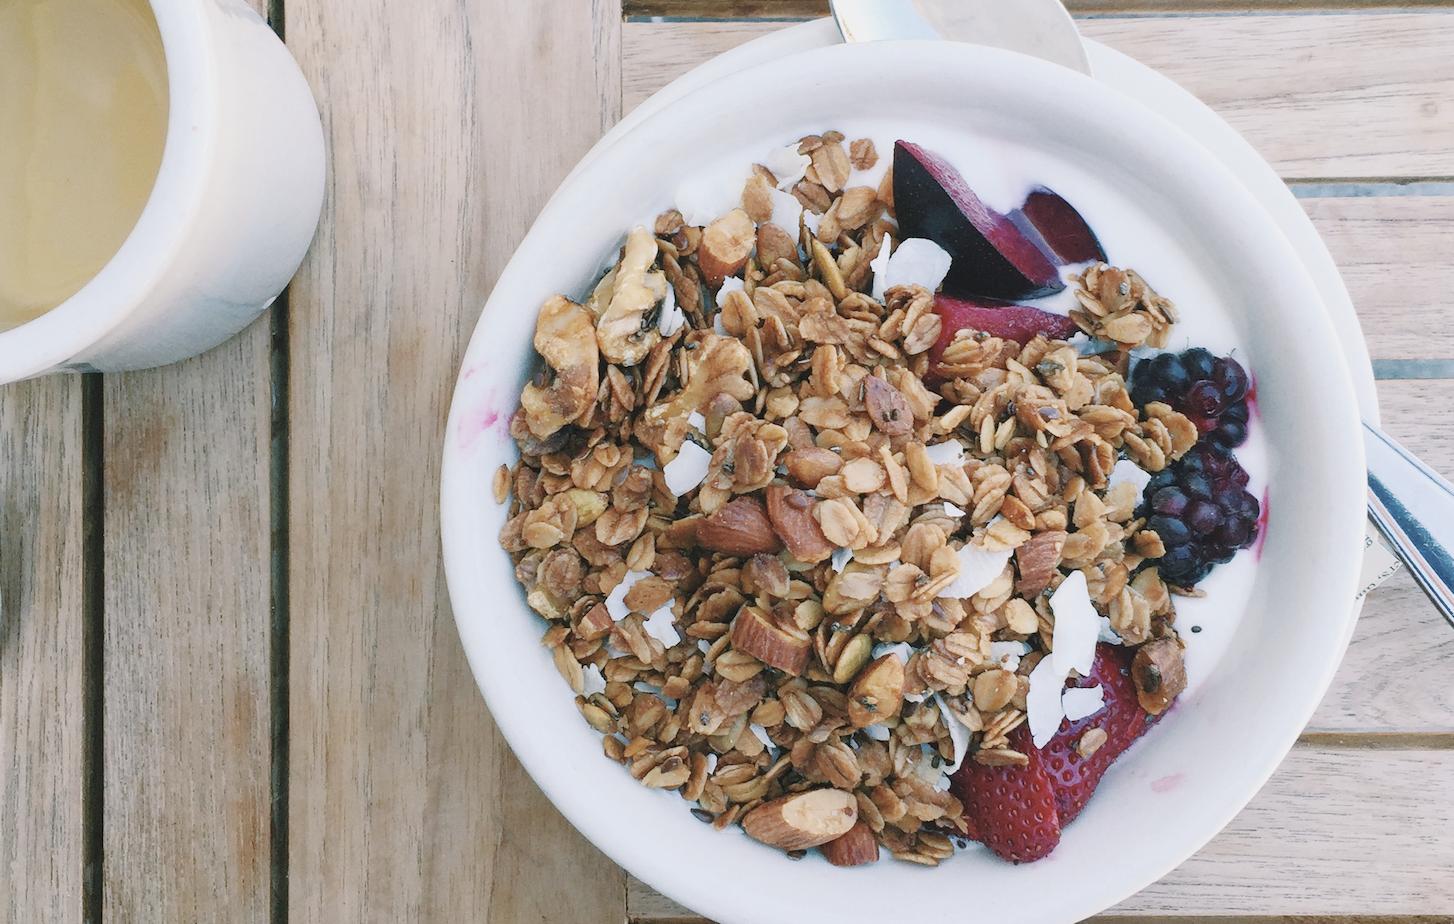 granola parfait on a table